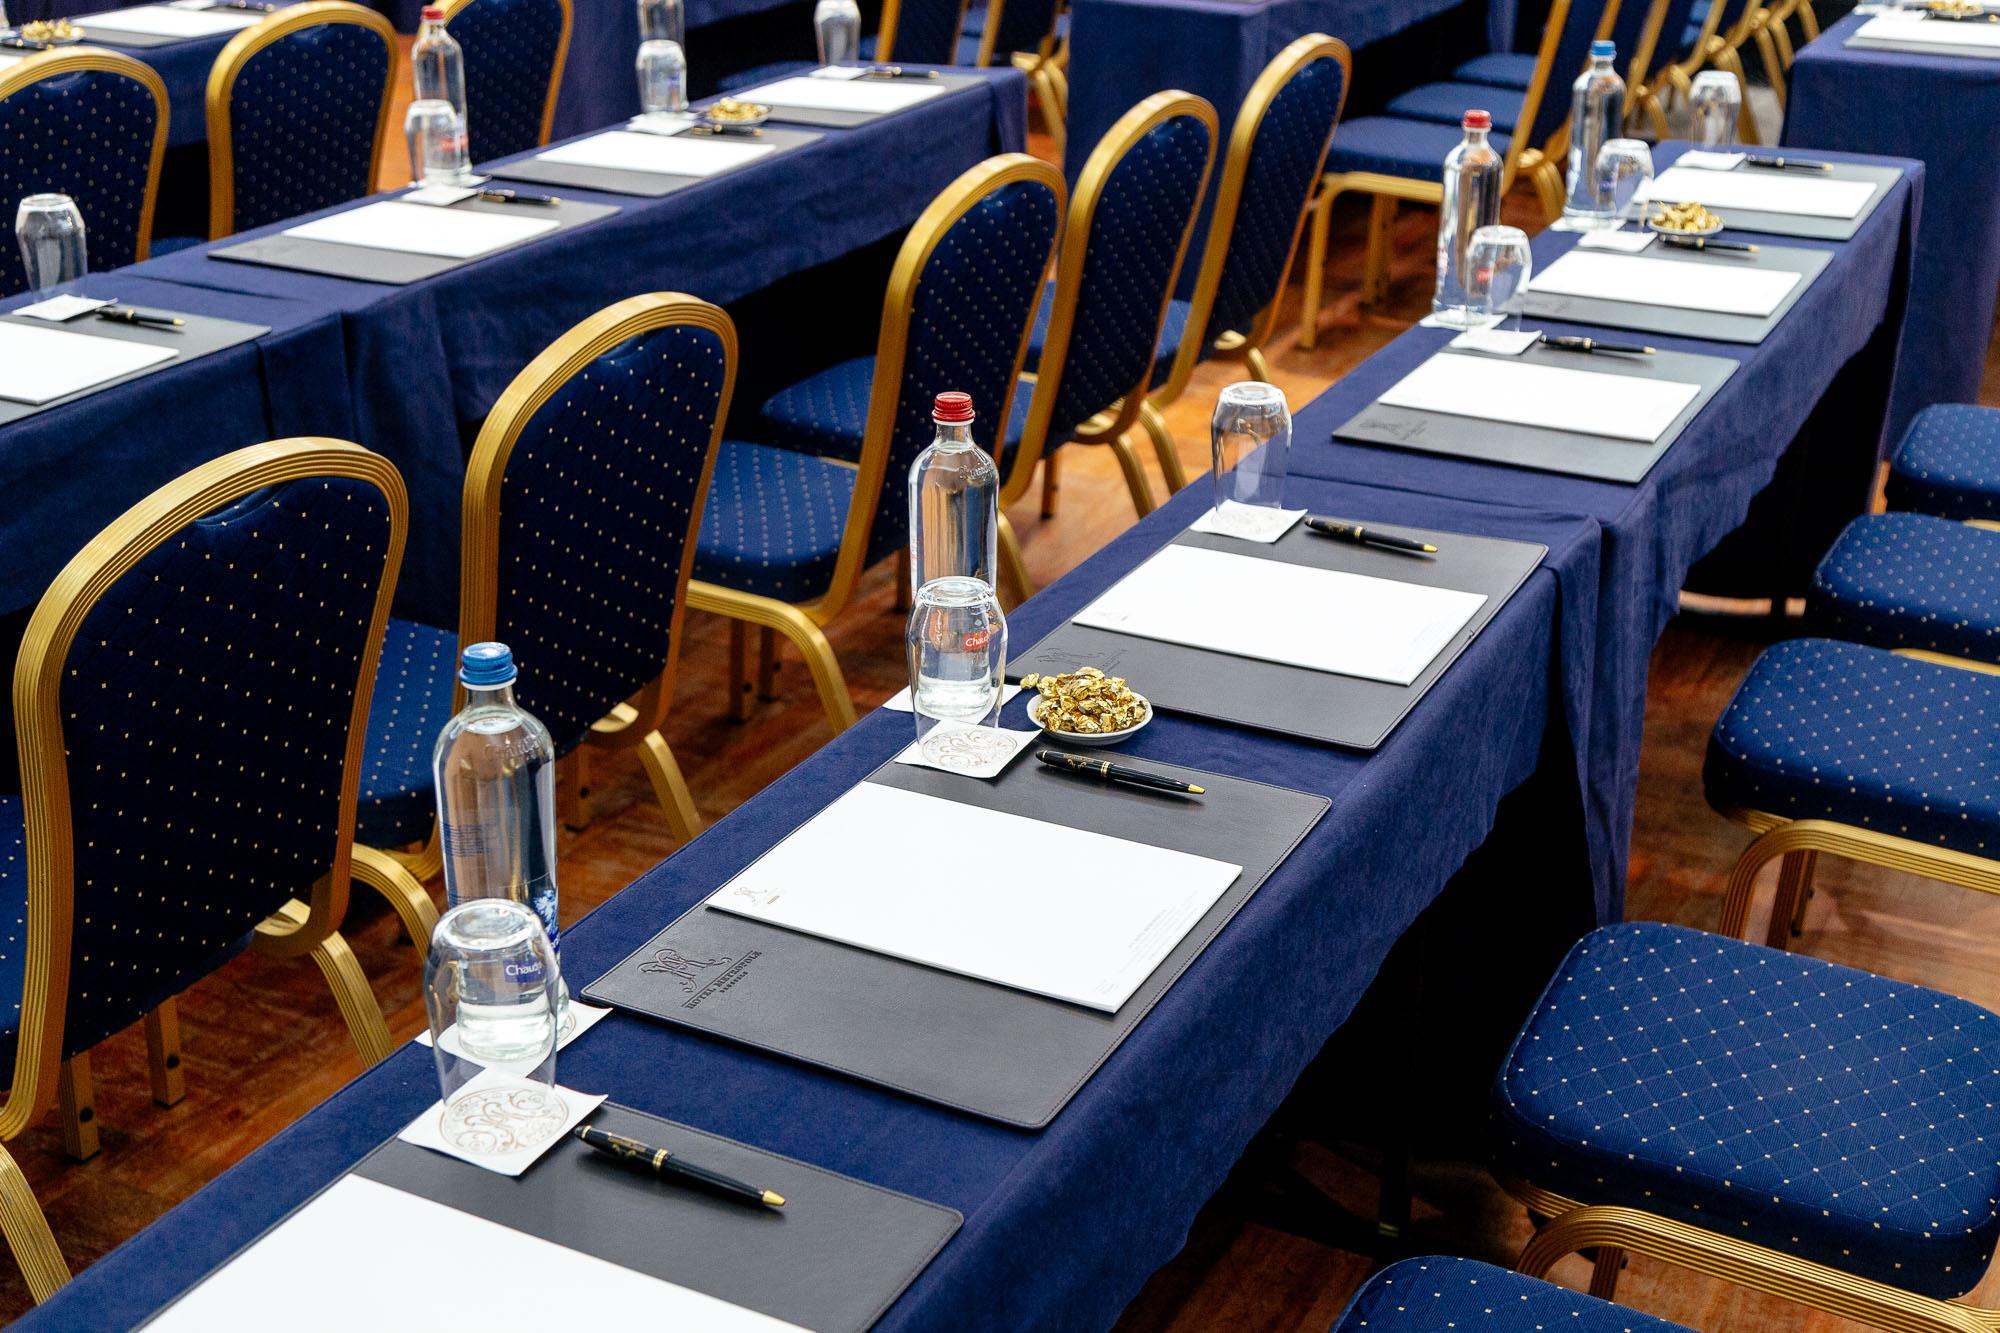 metropole_conference-11.jpg